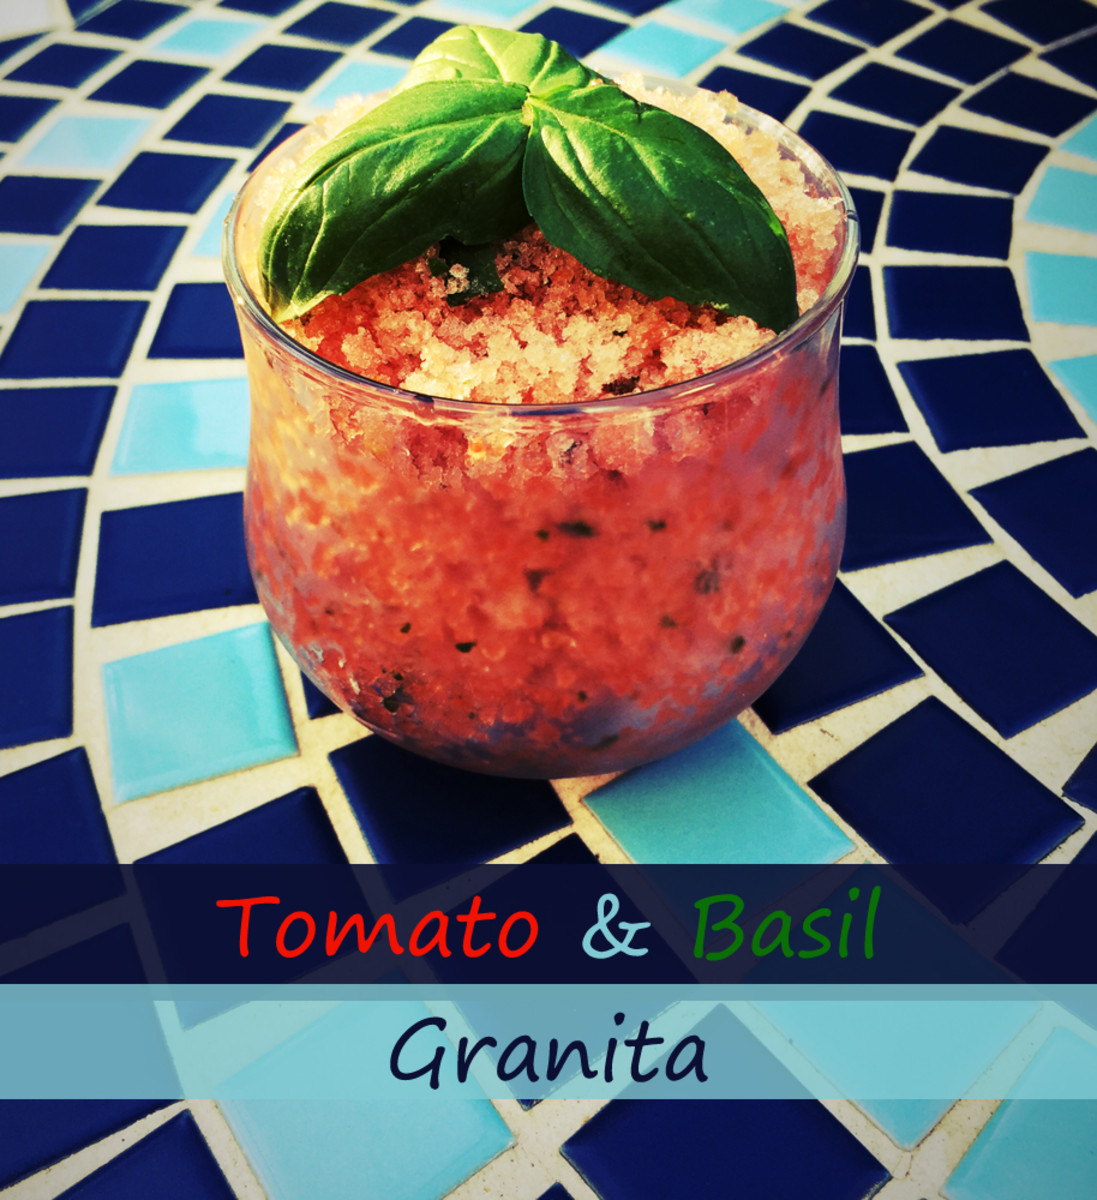 Tomato and Basil Granita